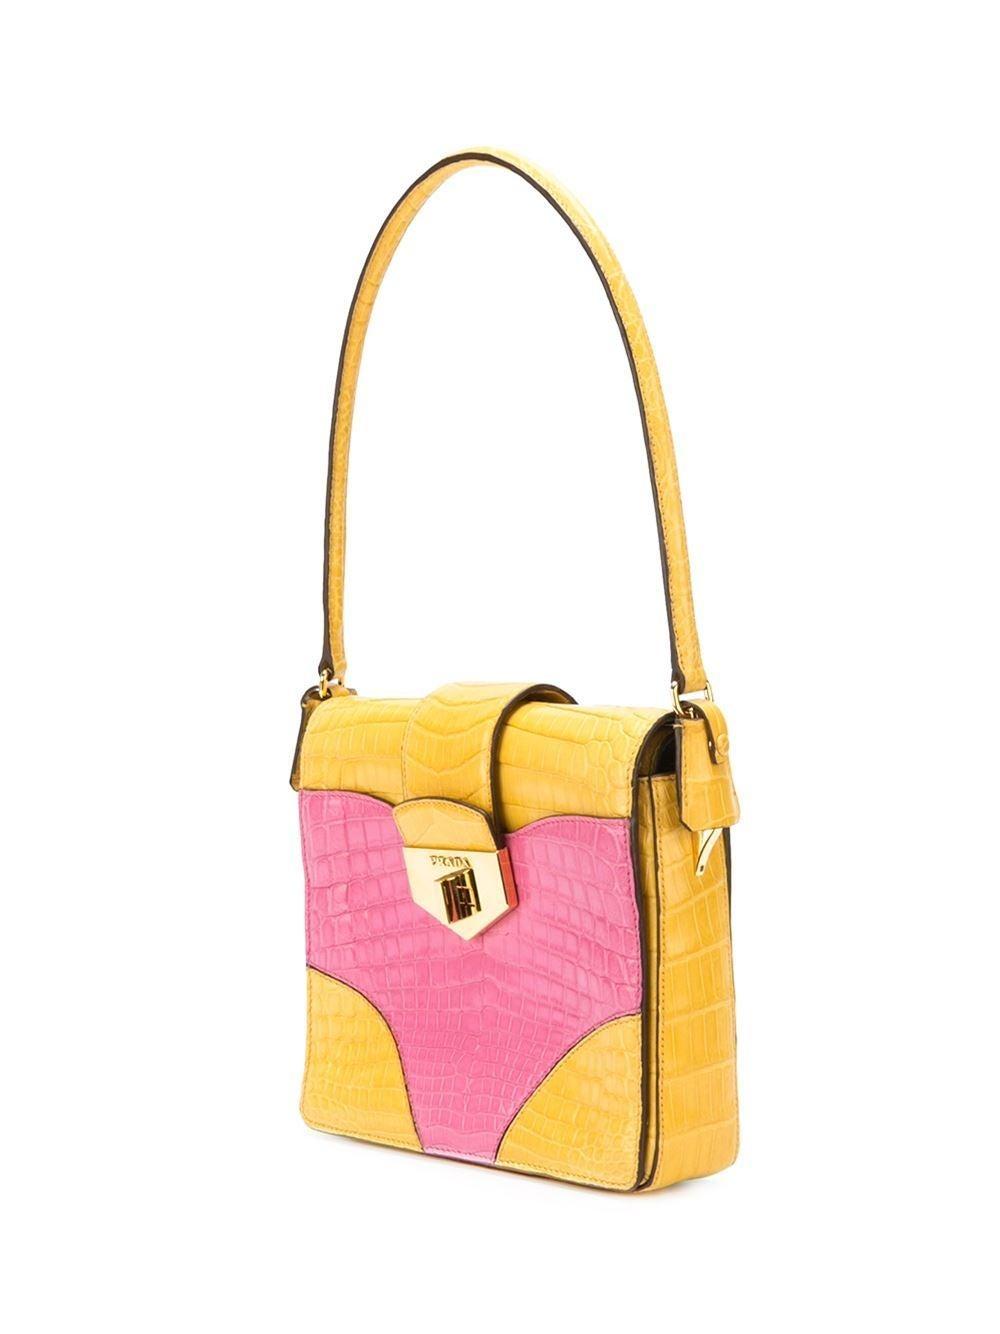 Orange UNIQUE MADE TO ORDER Prada Colour Block Crocodile Handbag For Sale